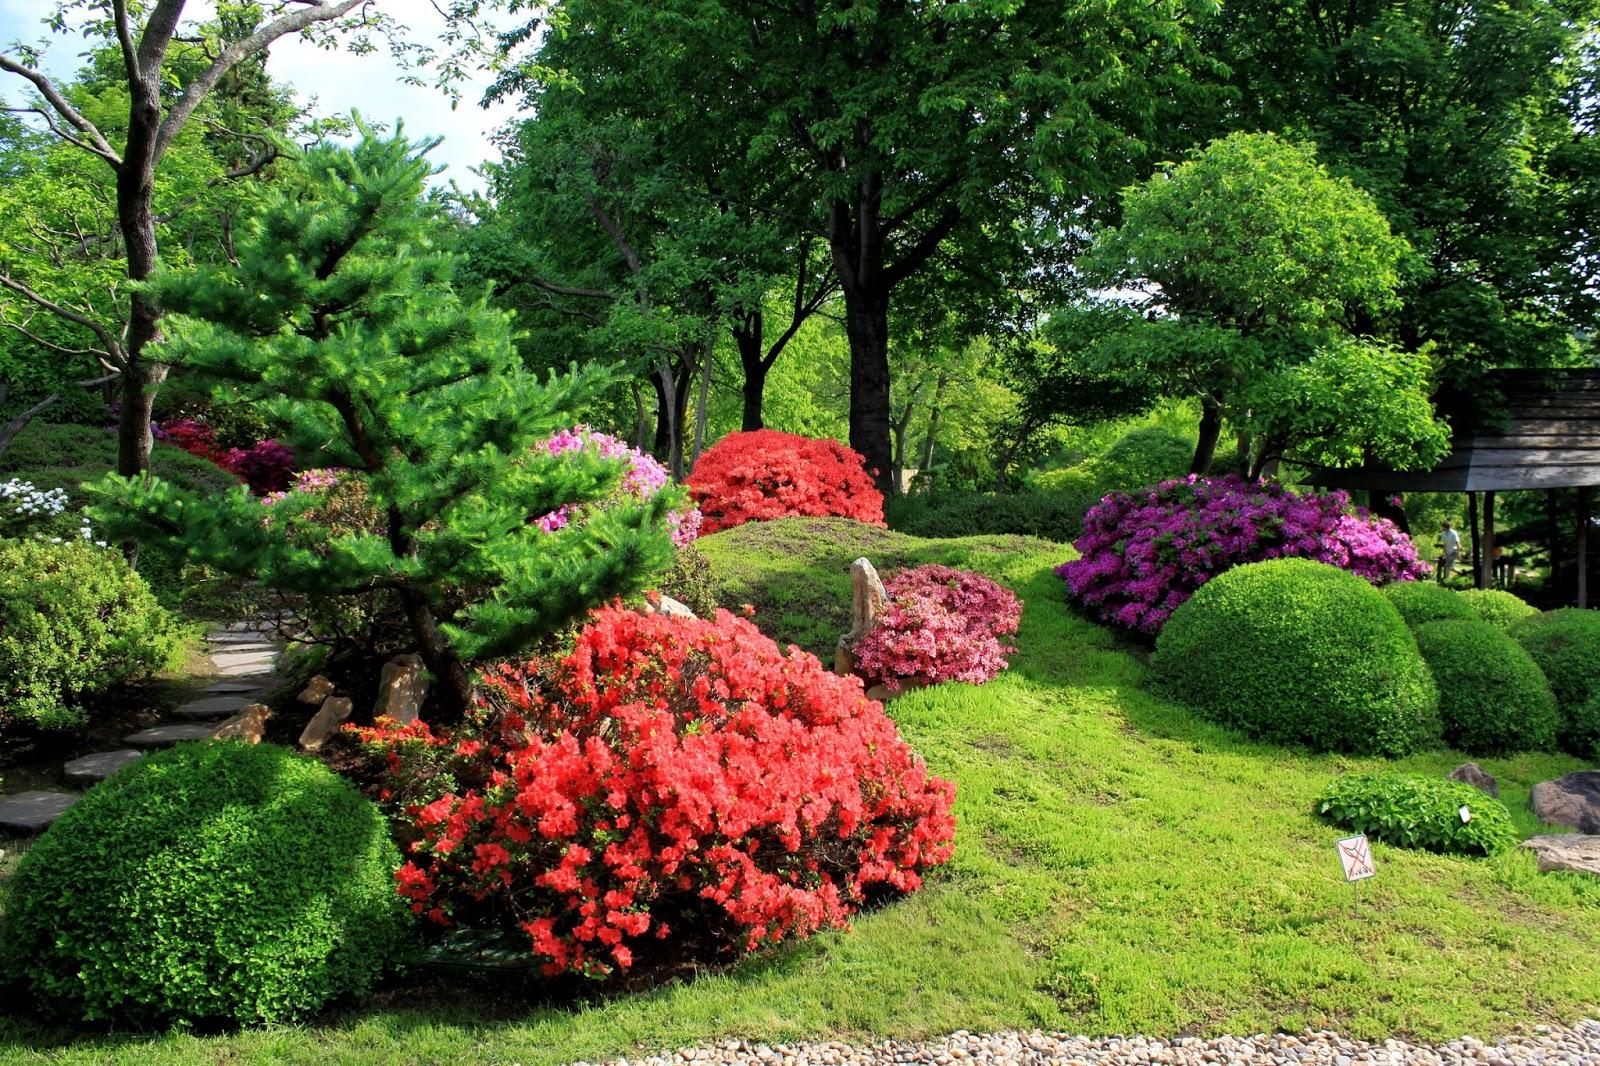 Fond ecran gratuit printemps paysage fonds d 39 cran hd for Photo de ecran pc